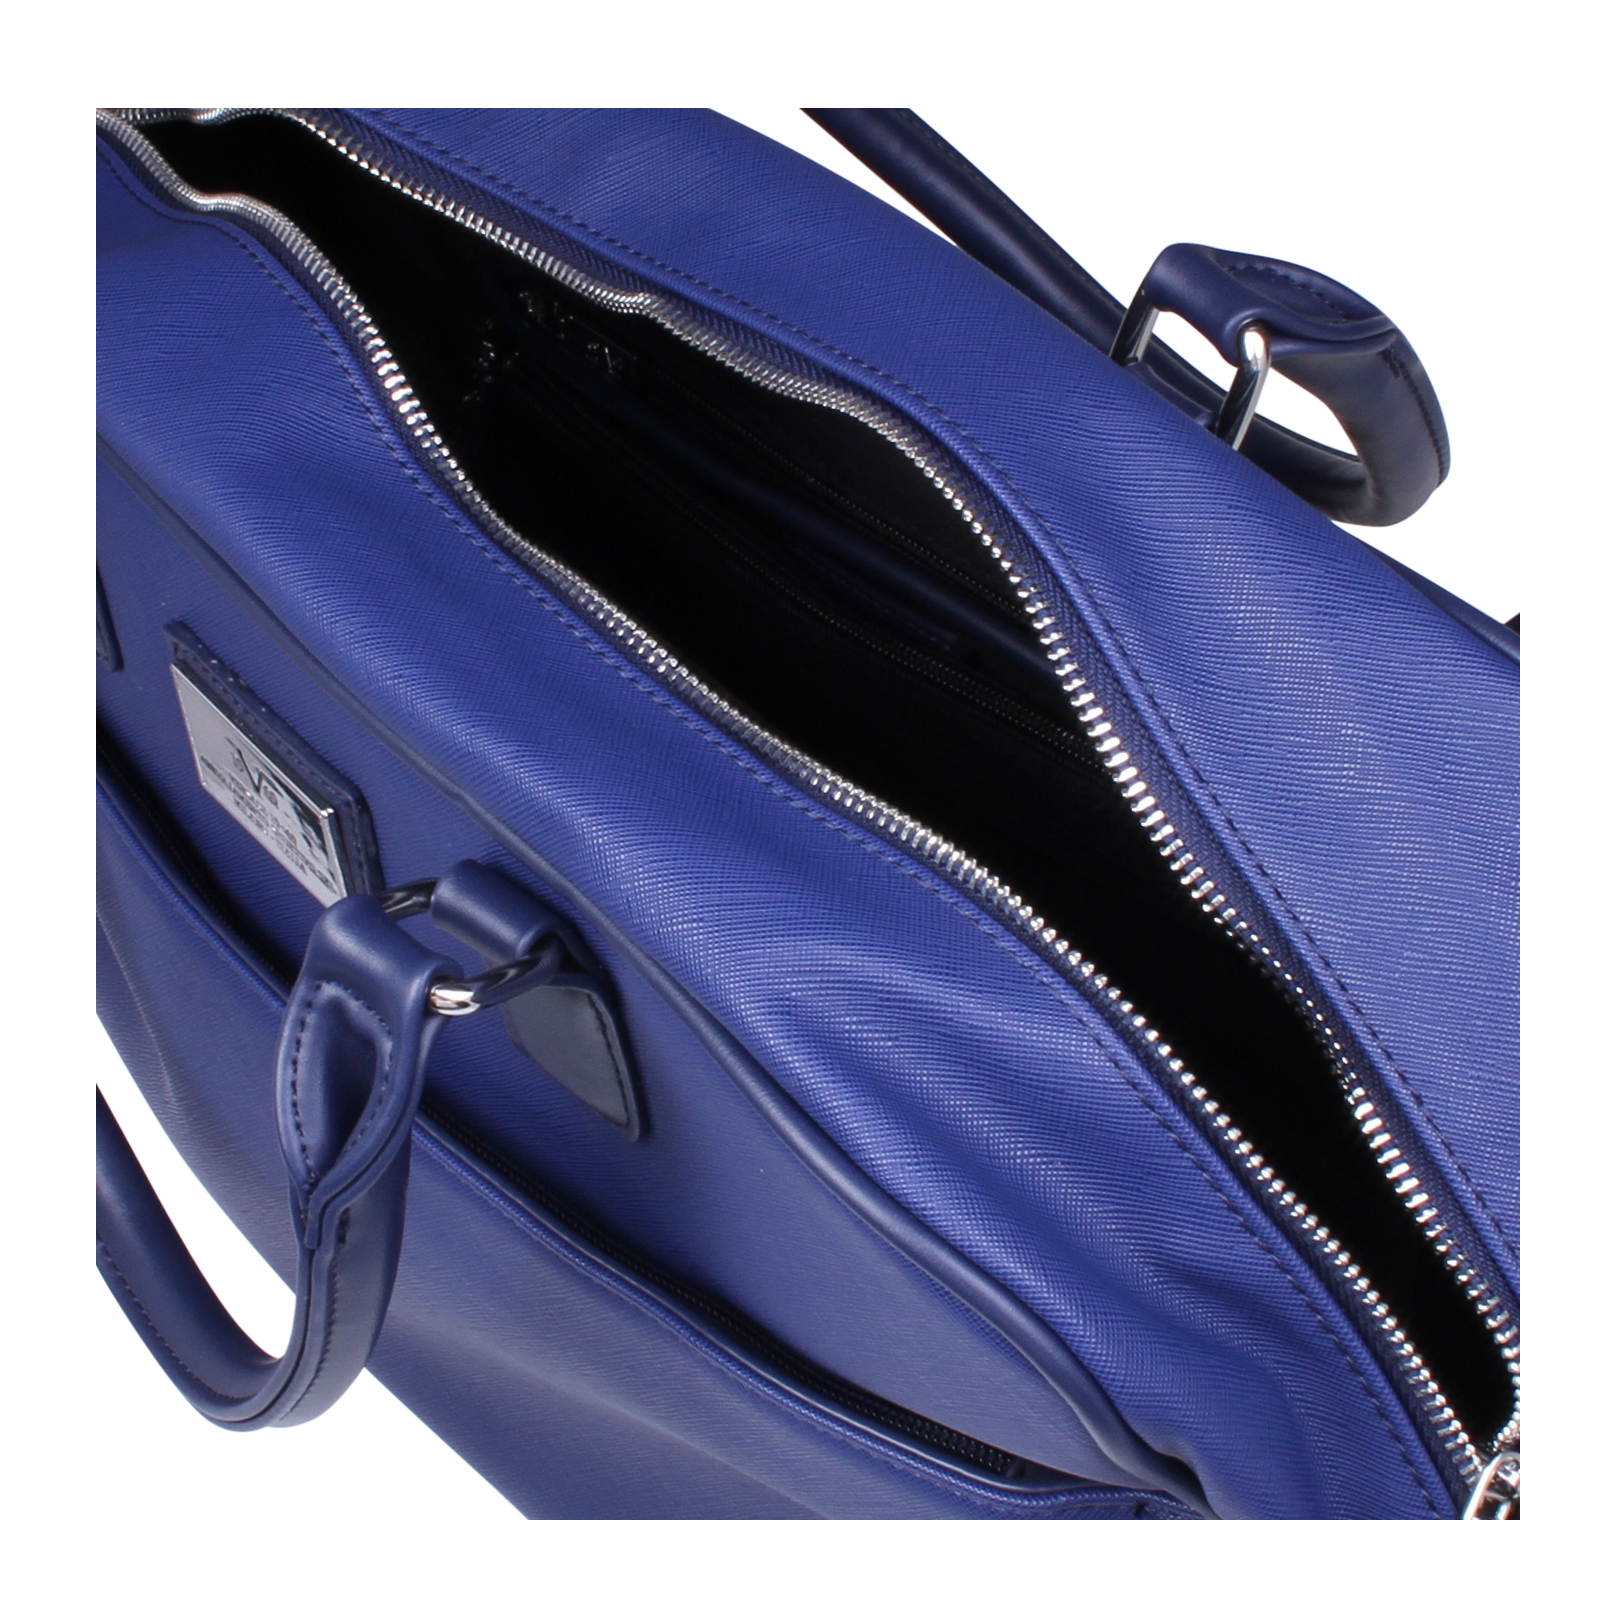 newland versace 1969 newland blue handbags by versace 1969. Black Bedroom Furniture Sets. Home Design Ideas